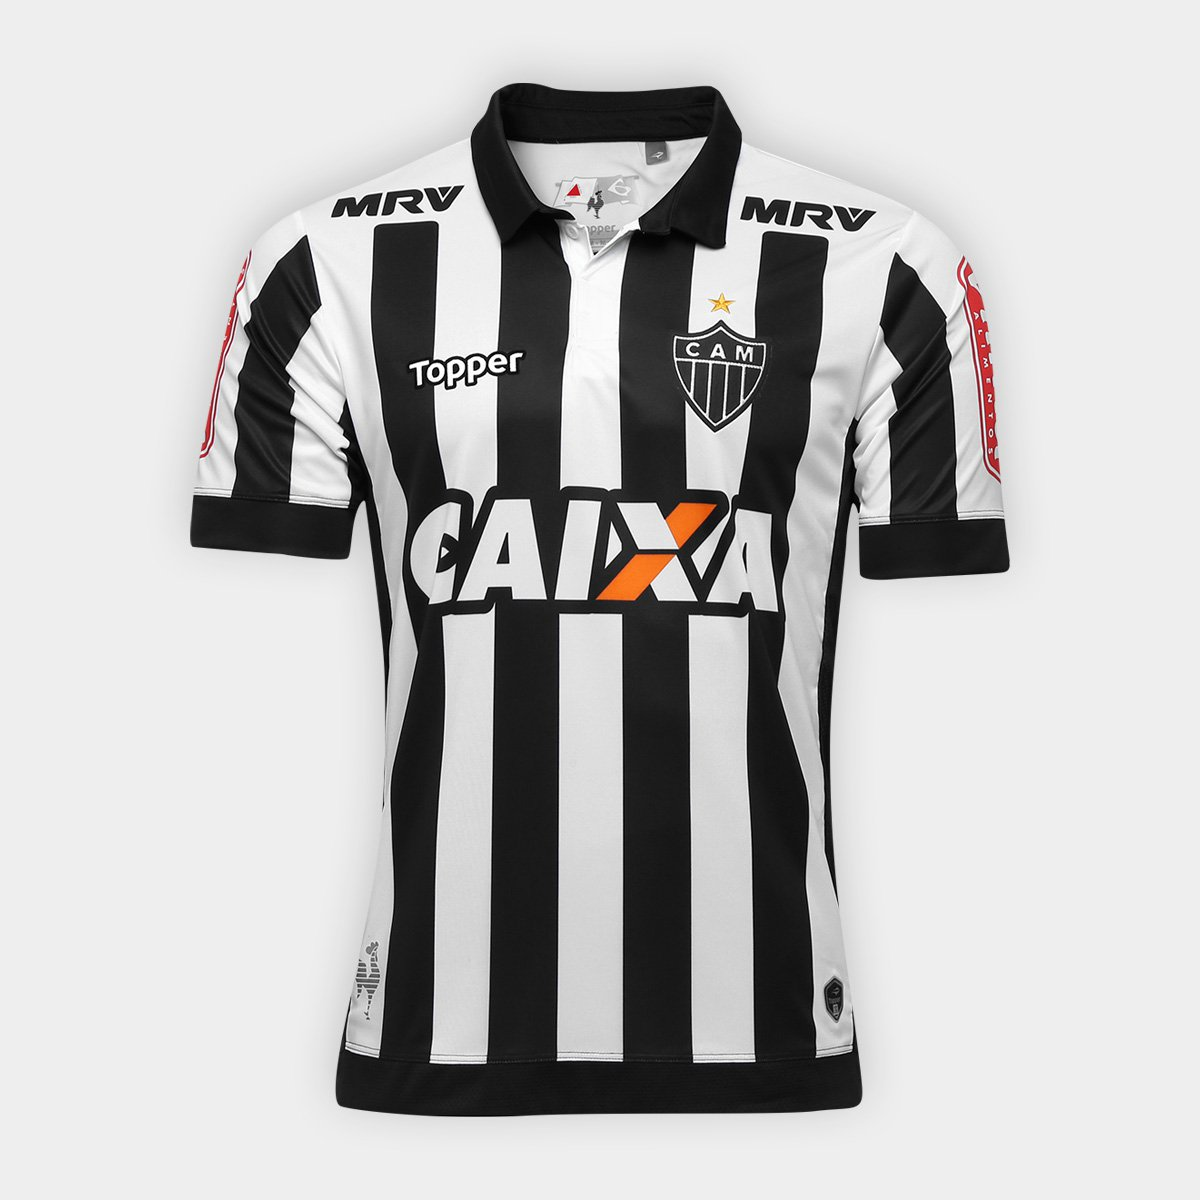 b285da15bc Camisa Atlético-MG I 17 18 s nº - Torcedor Topper Masculina - Compre ...